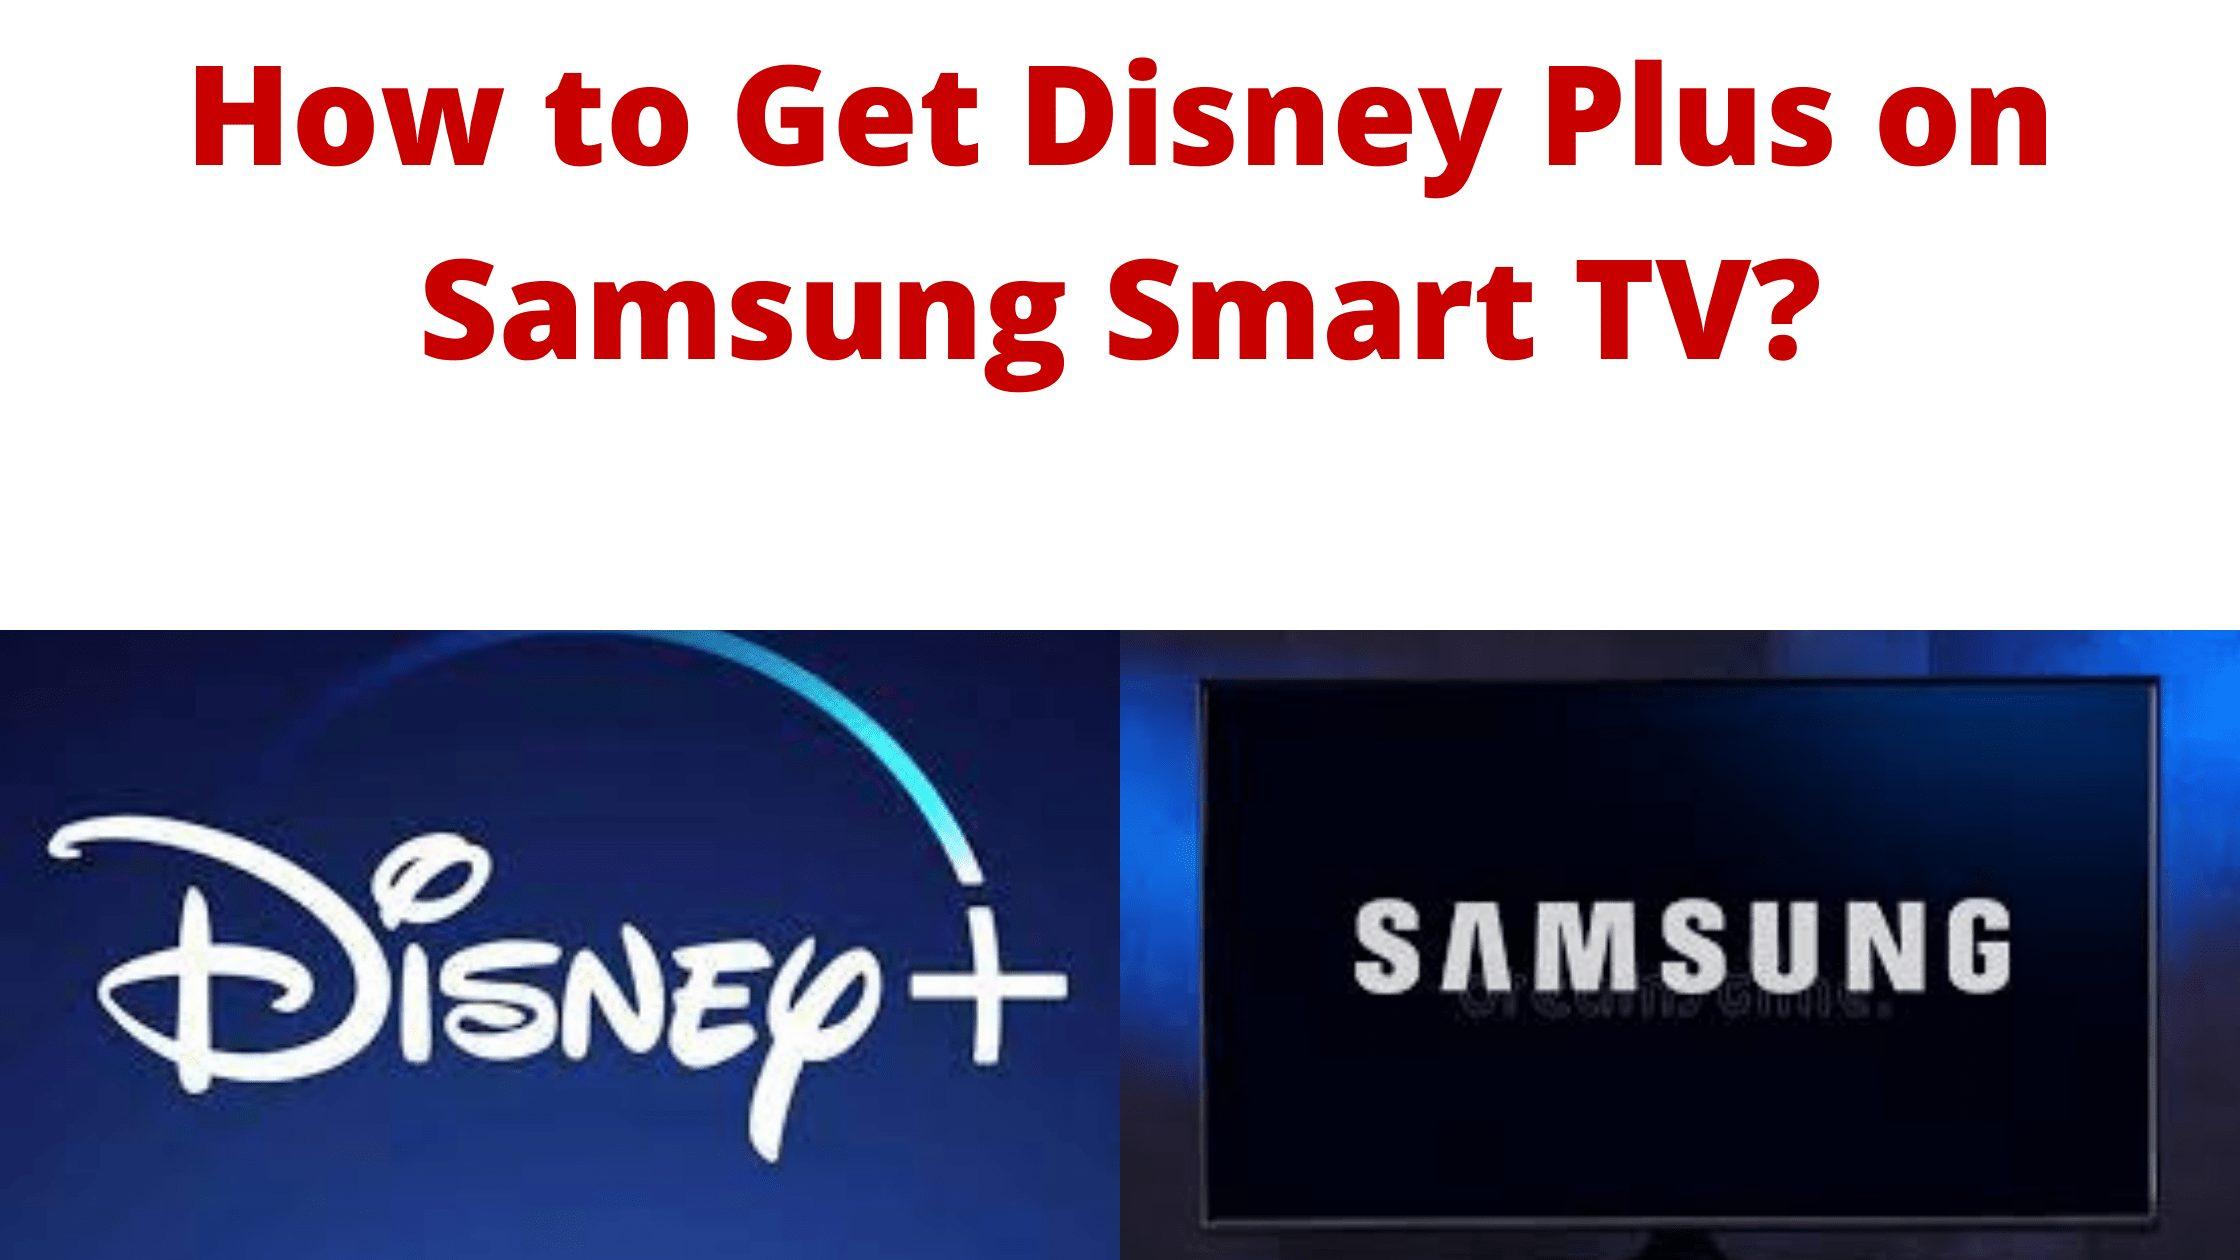 Disney Plus on Samsung Smart TV